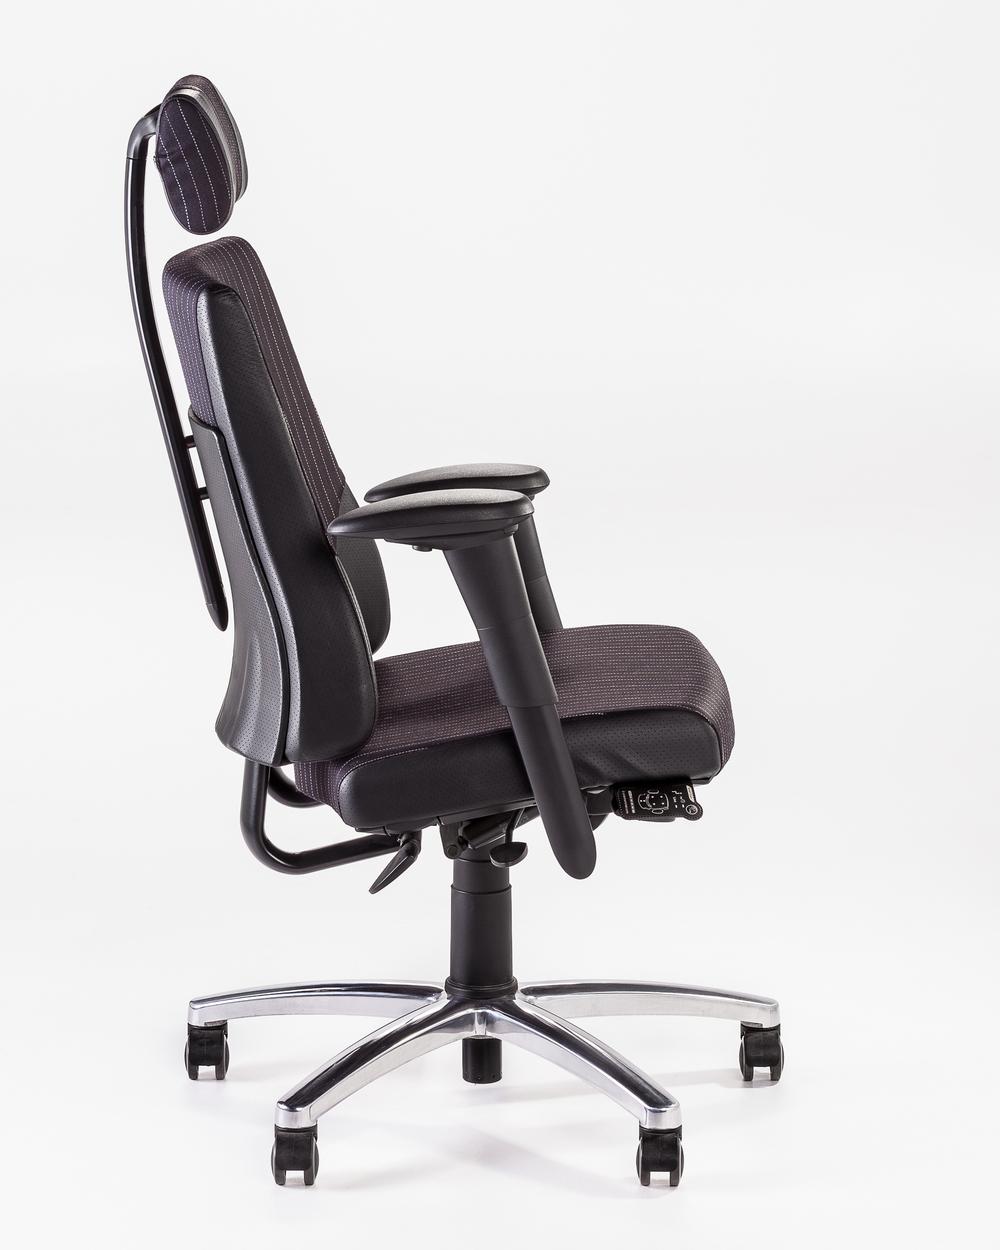 VDU chair glasgow.jpg